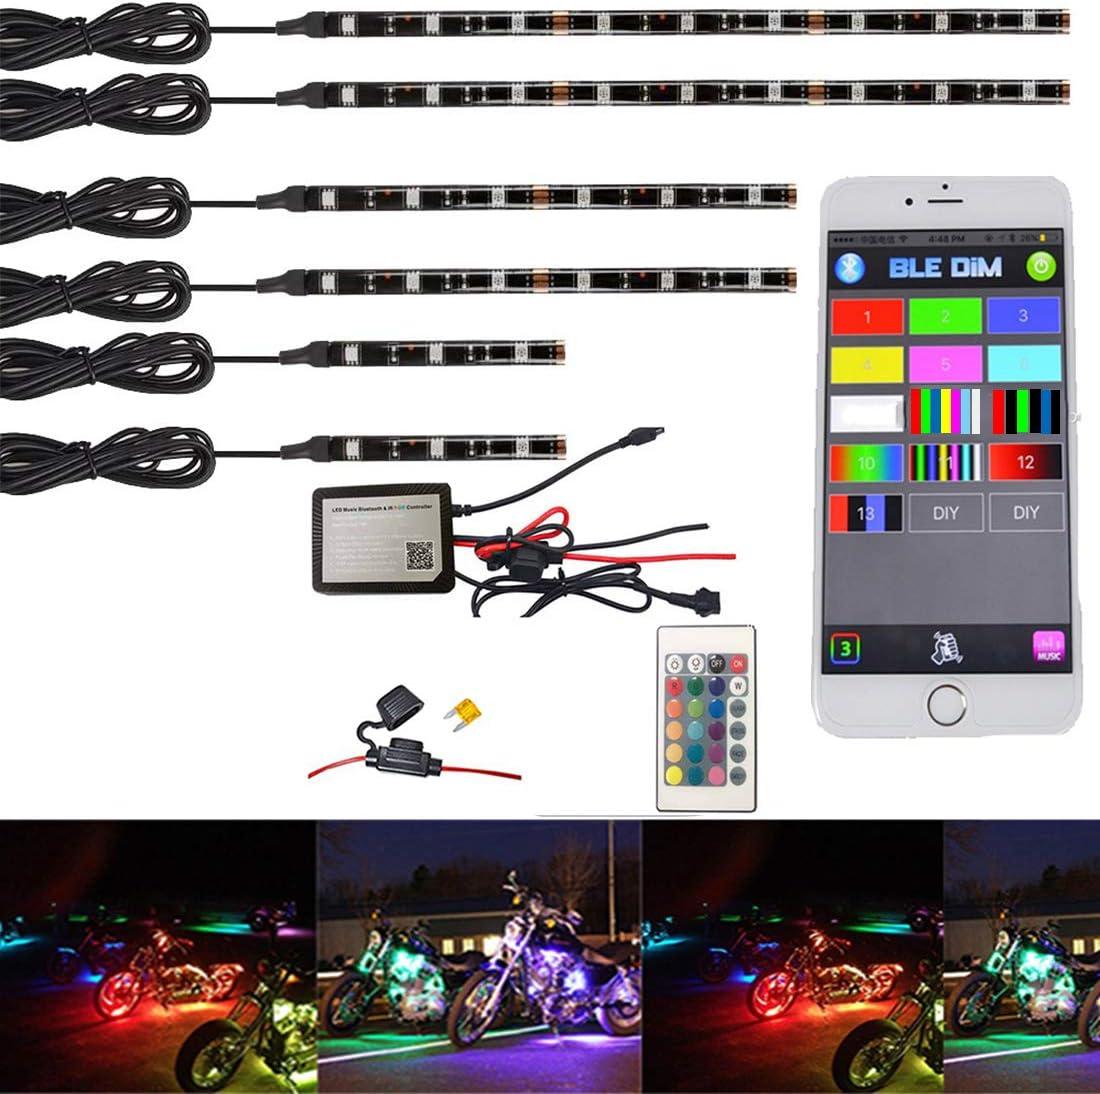 NBWDY 6Pcs Motorcycle LED Light Kit Strips with RGB 4-Key Wireless Remote Control for Harley Davidson Honda Kawasaki Suzuki